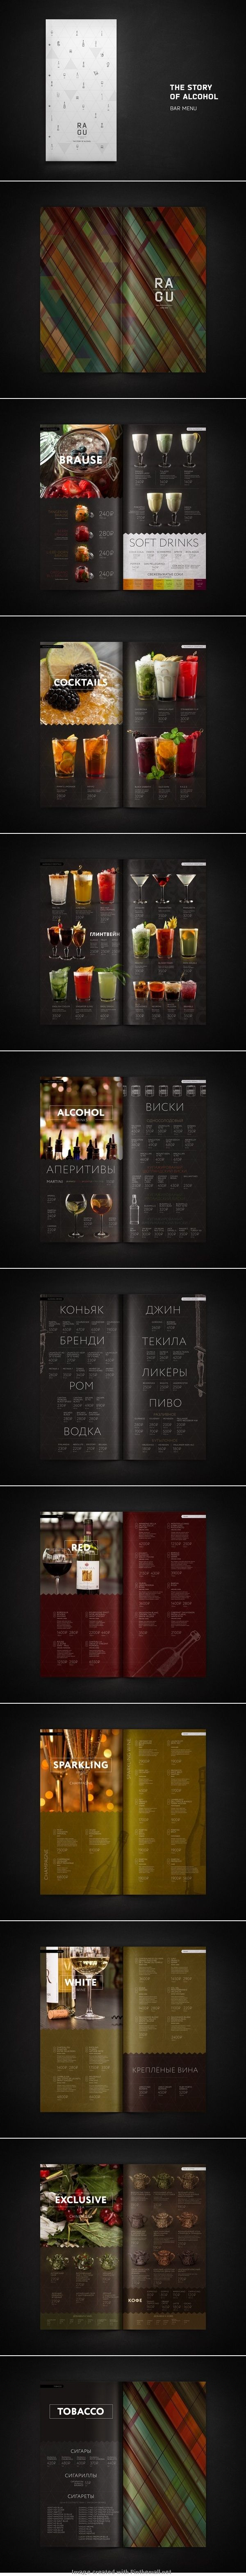 Ragu identity menu